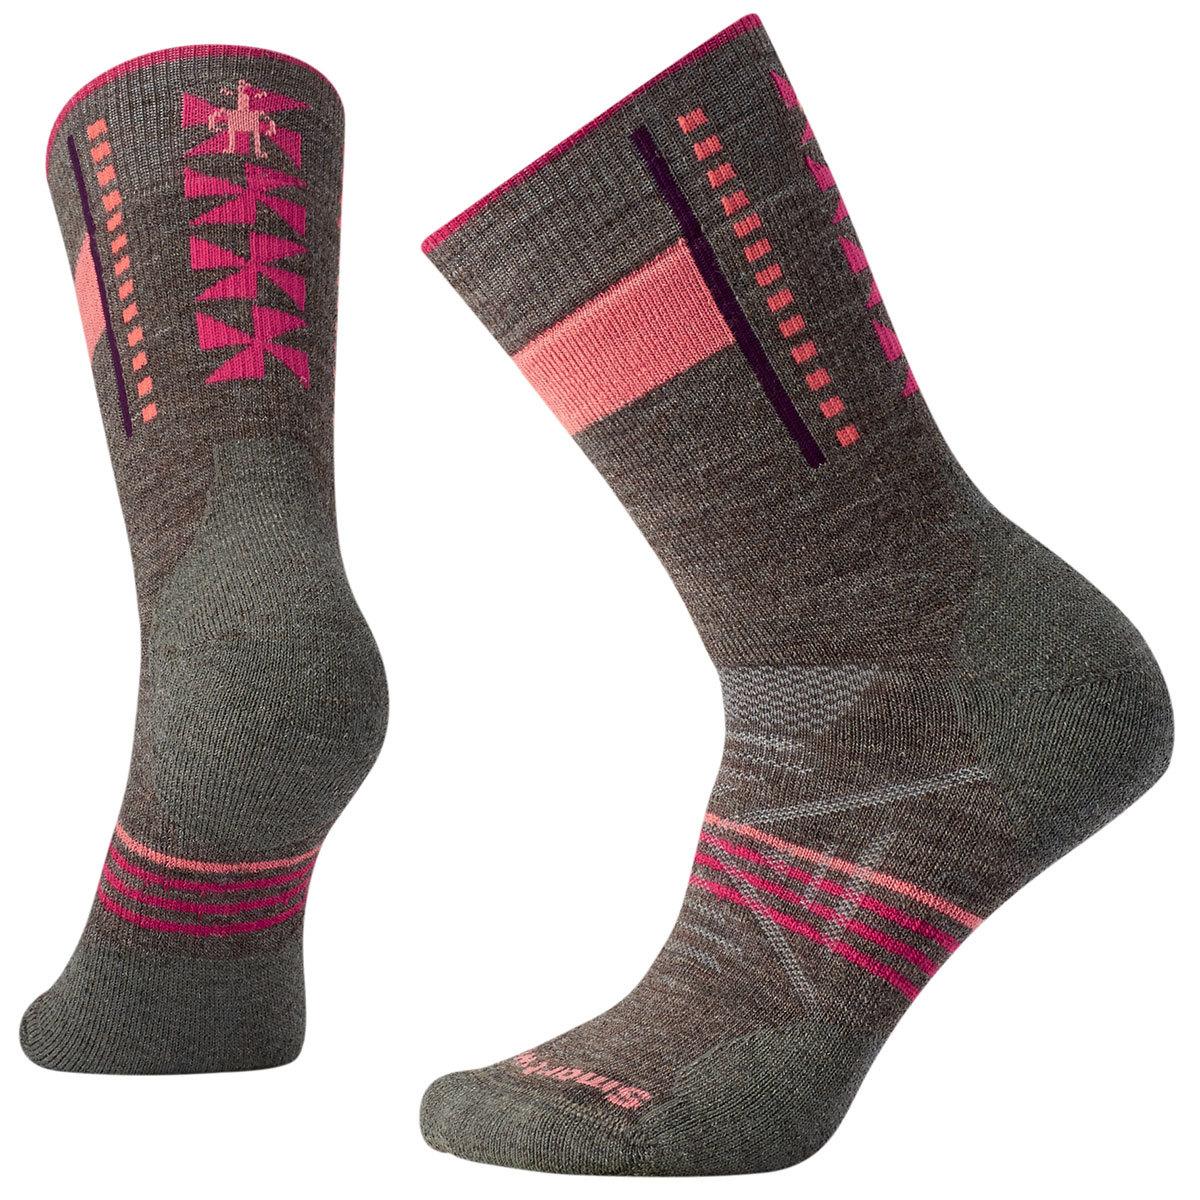 Smartwool Women's Phd Outdoor Medium Pattern Crew Socks - Brown, L